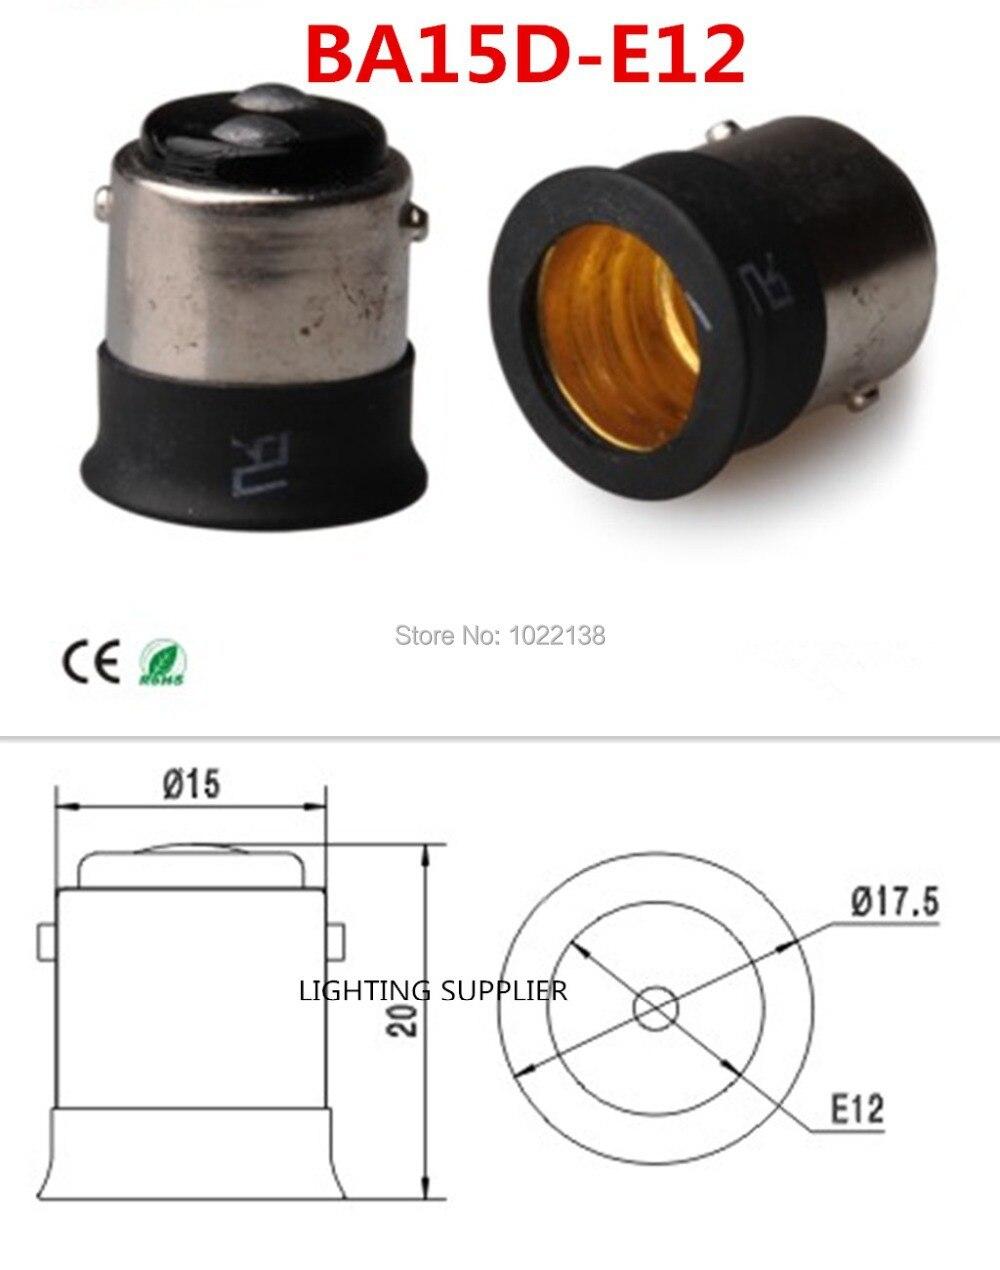 10 Pcs/lot Ba15d To E12 Lamp Base Holder Socket Led Light Lamp Bulb Adapter Converter Wholesale Fashionable Style; In